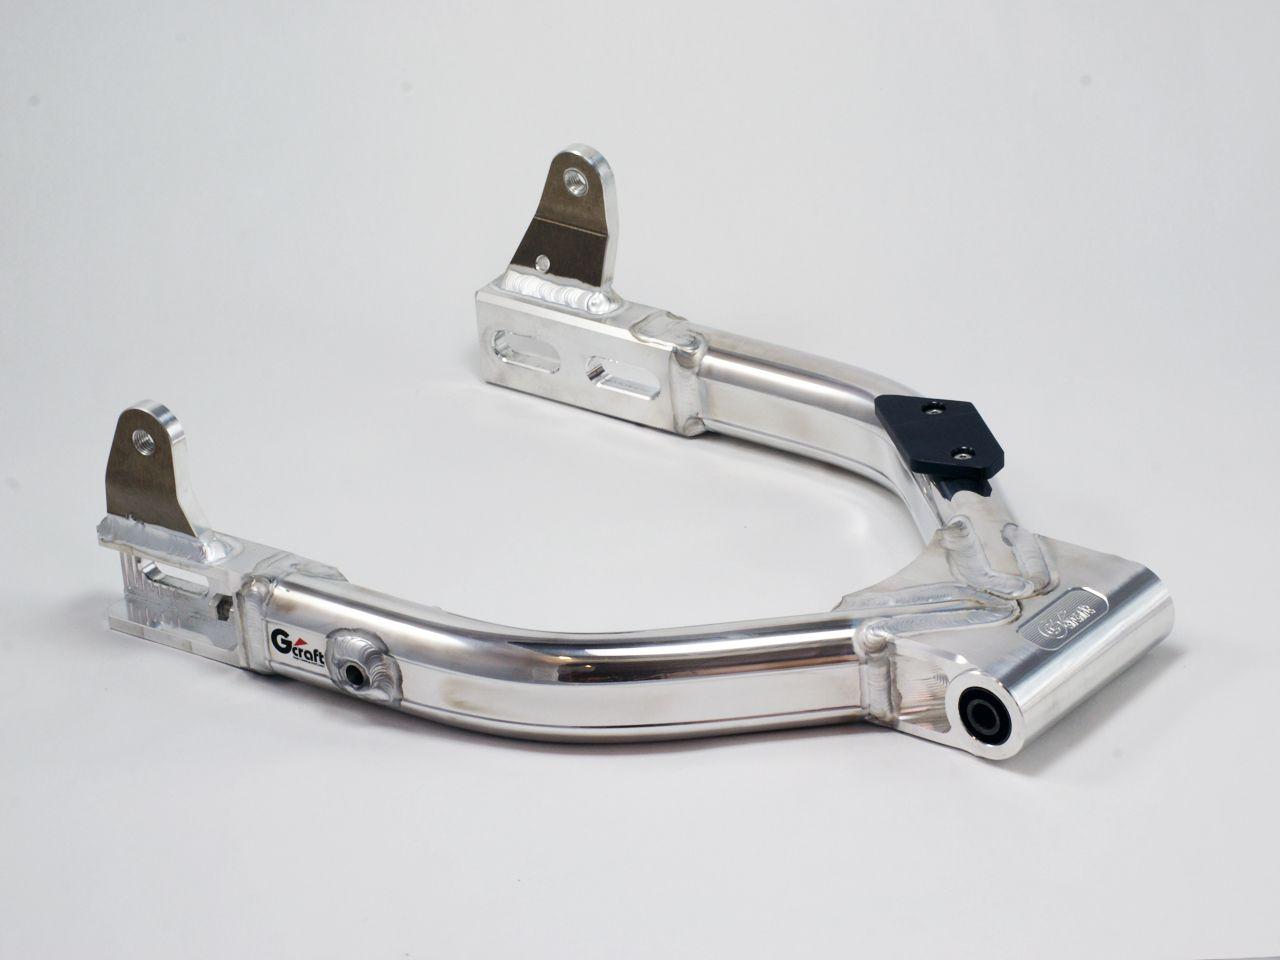 【G-Craft】Dax用 後搖臂 (雙避震 12cm Long) - 「Webike-摩托百貨」